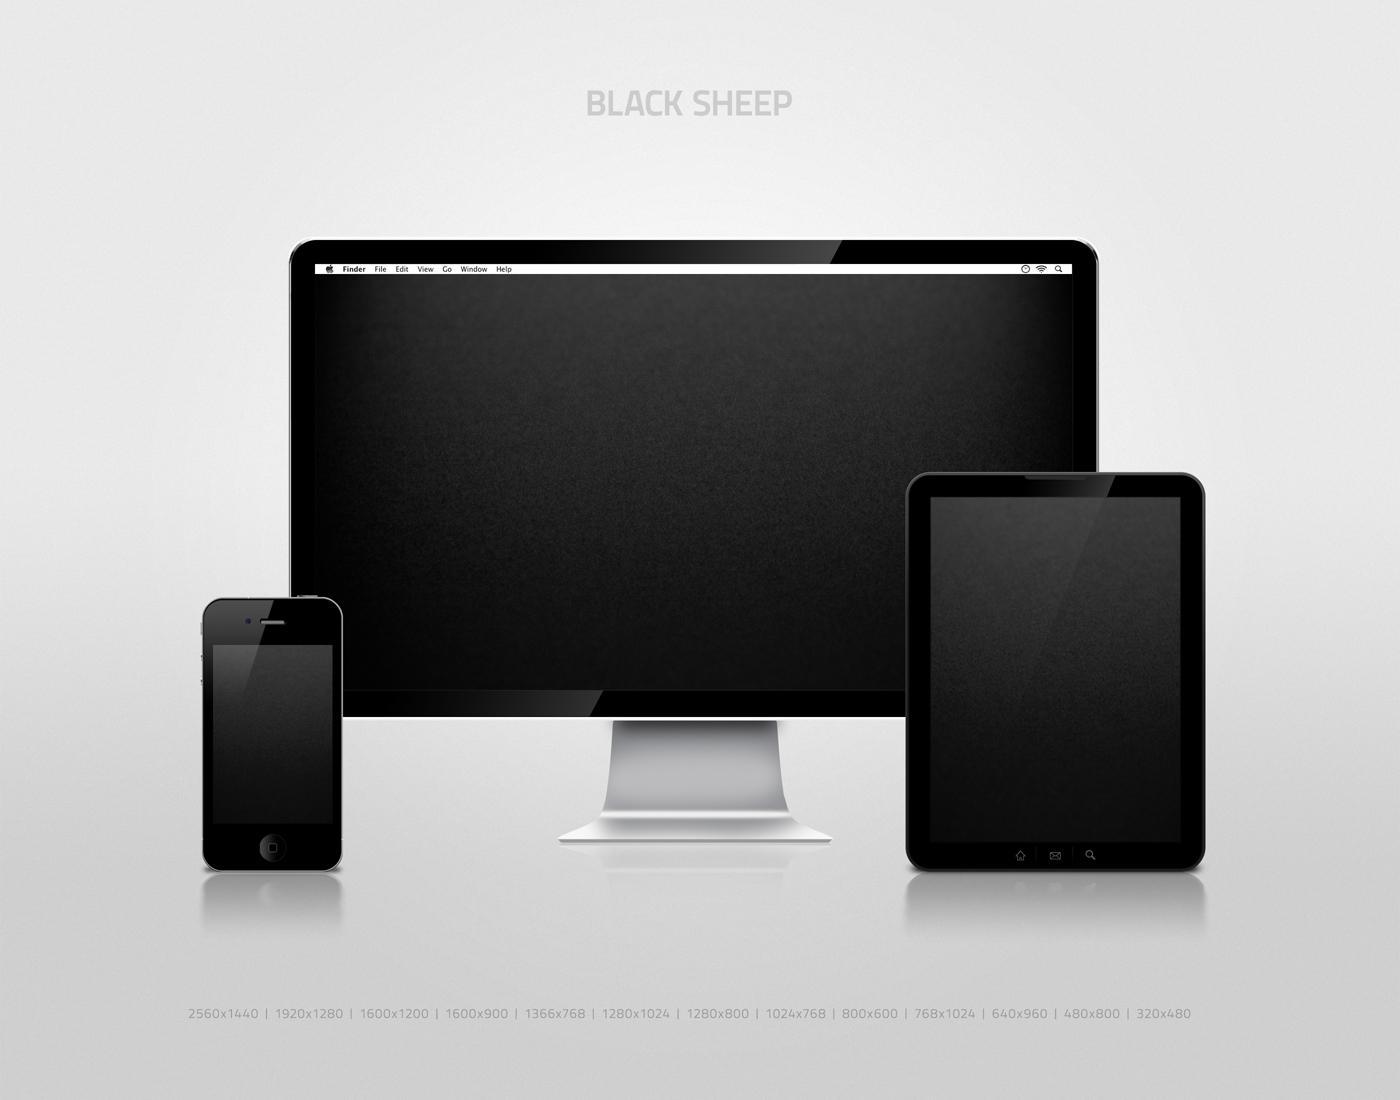 Black Sheep Wallpaper by nokari